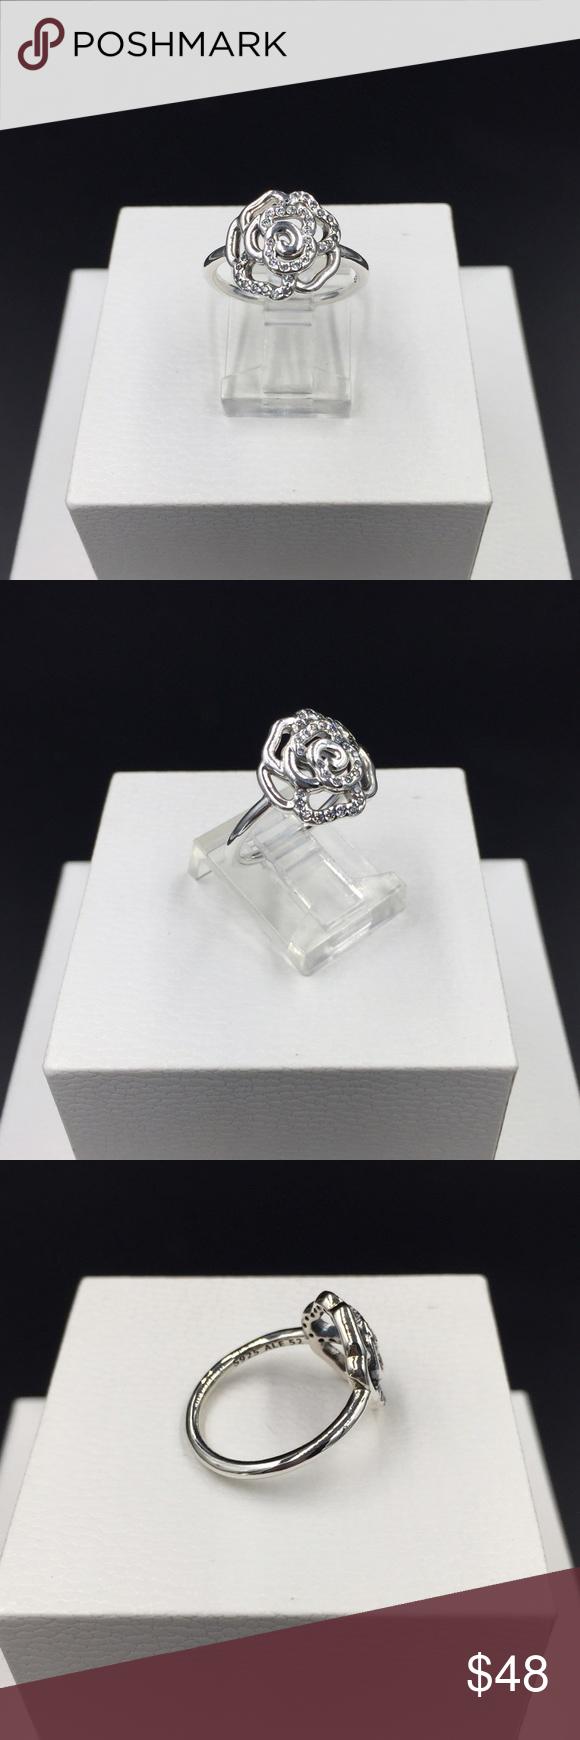 041e72903 Pandora Ring New Pandora